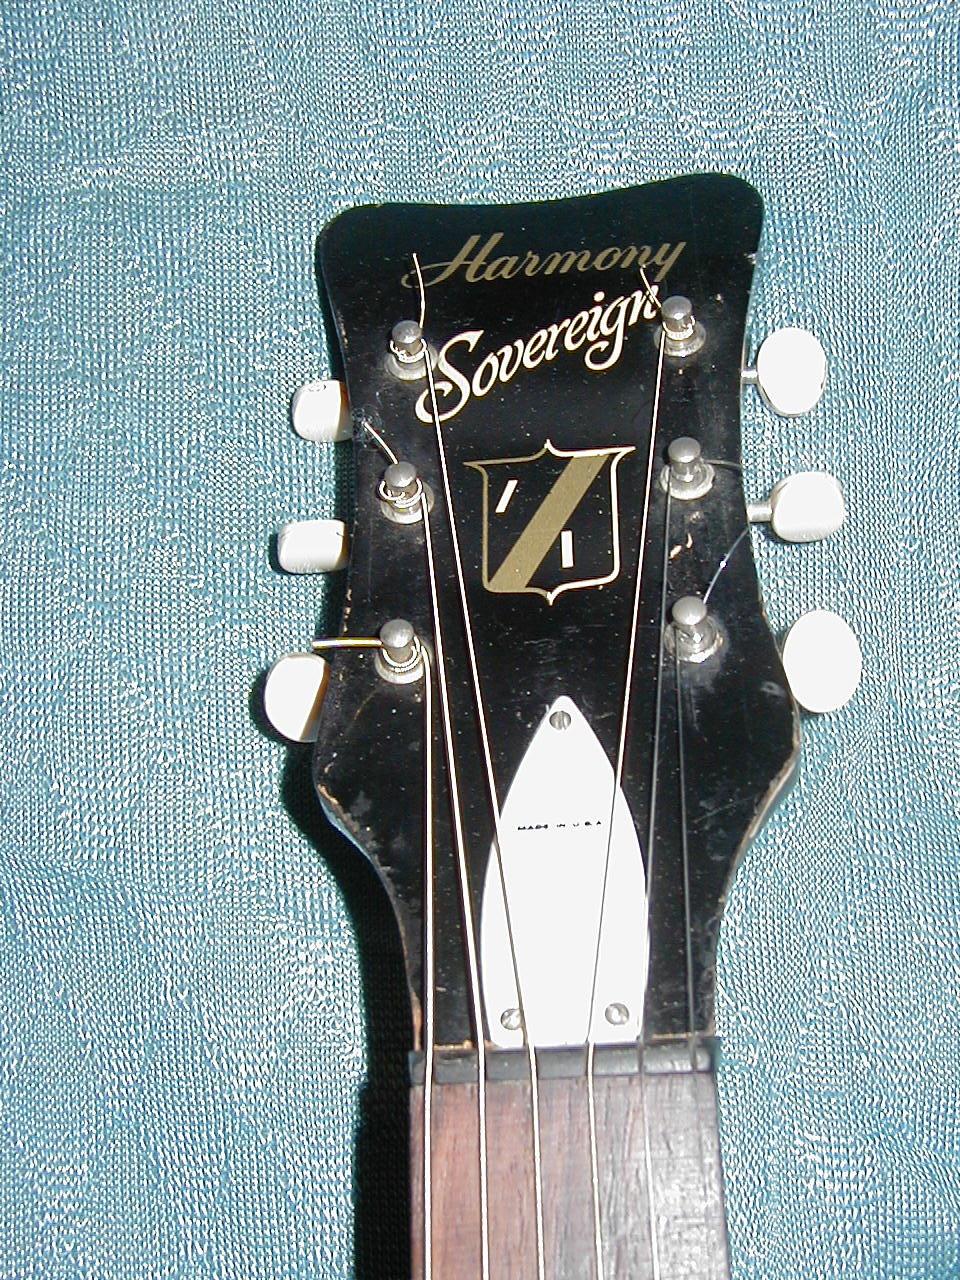 harmony guitar serial number database